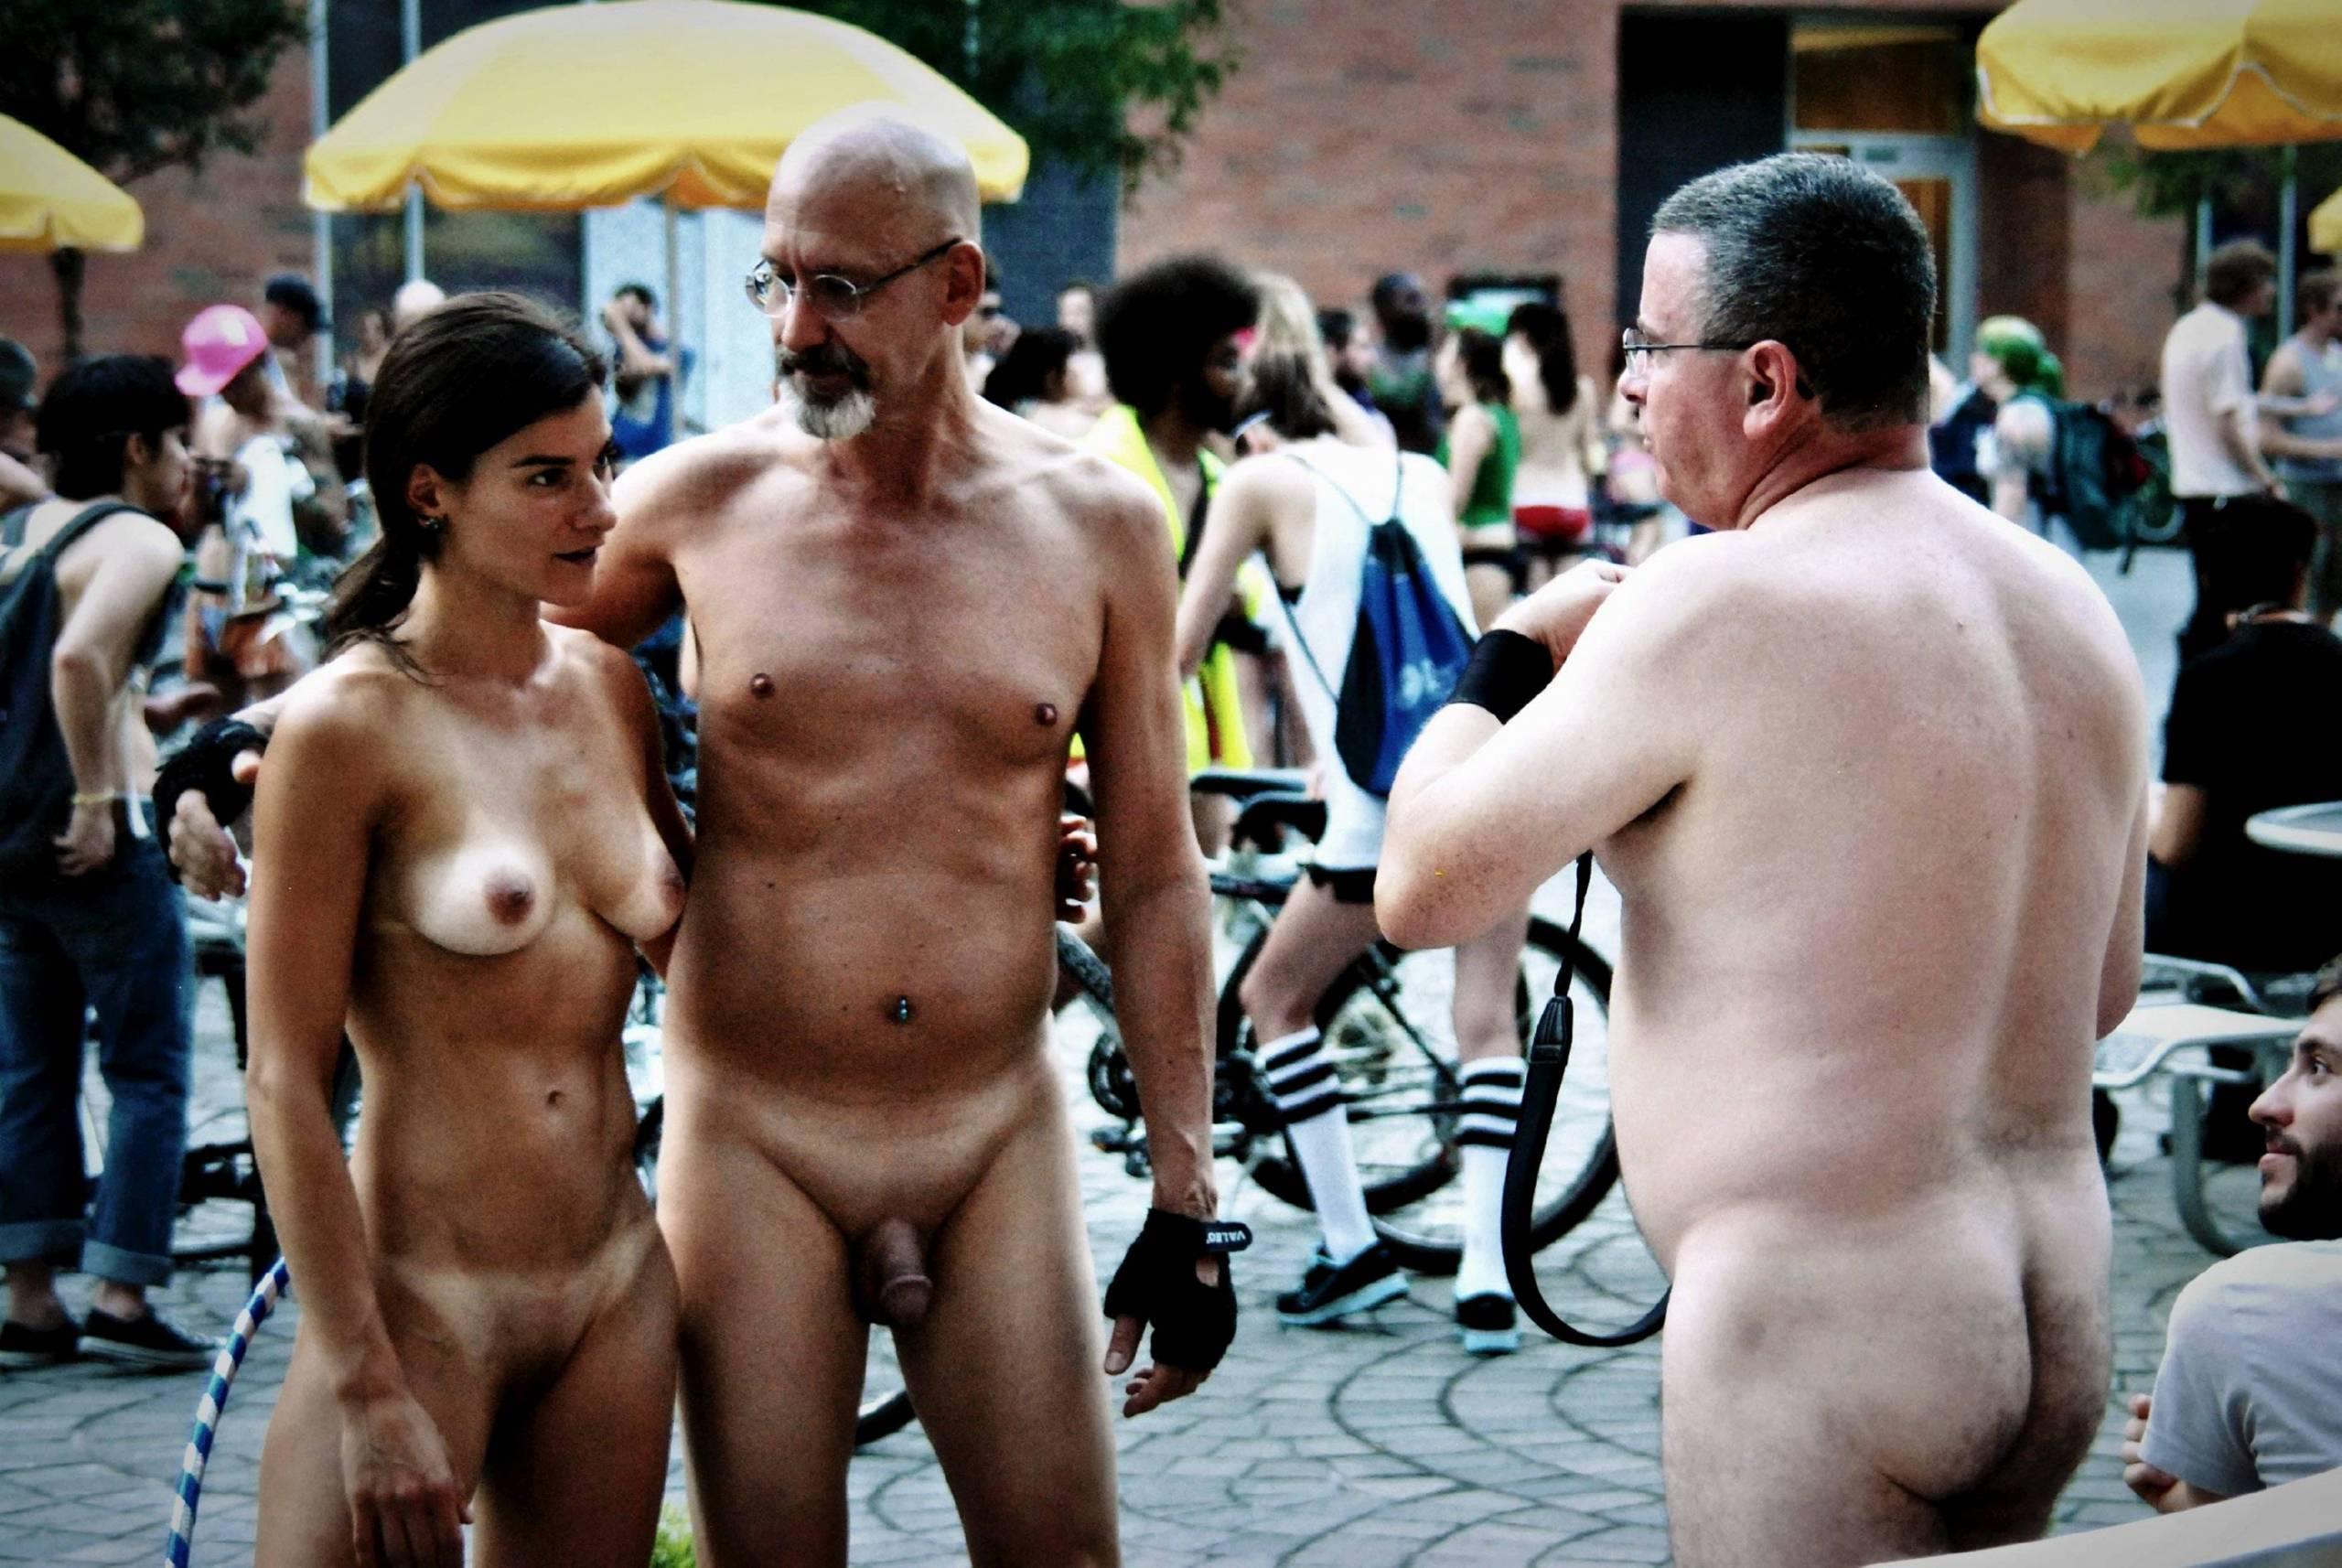 Nudist Photos World Naked Bike Ride [WNBR] UK 2011 - 2